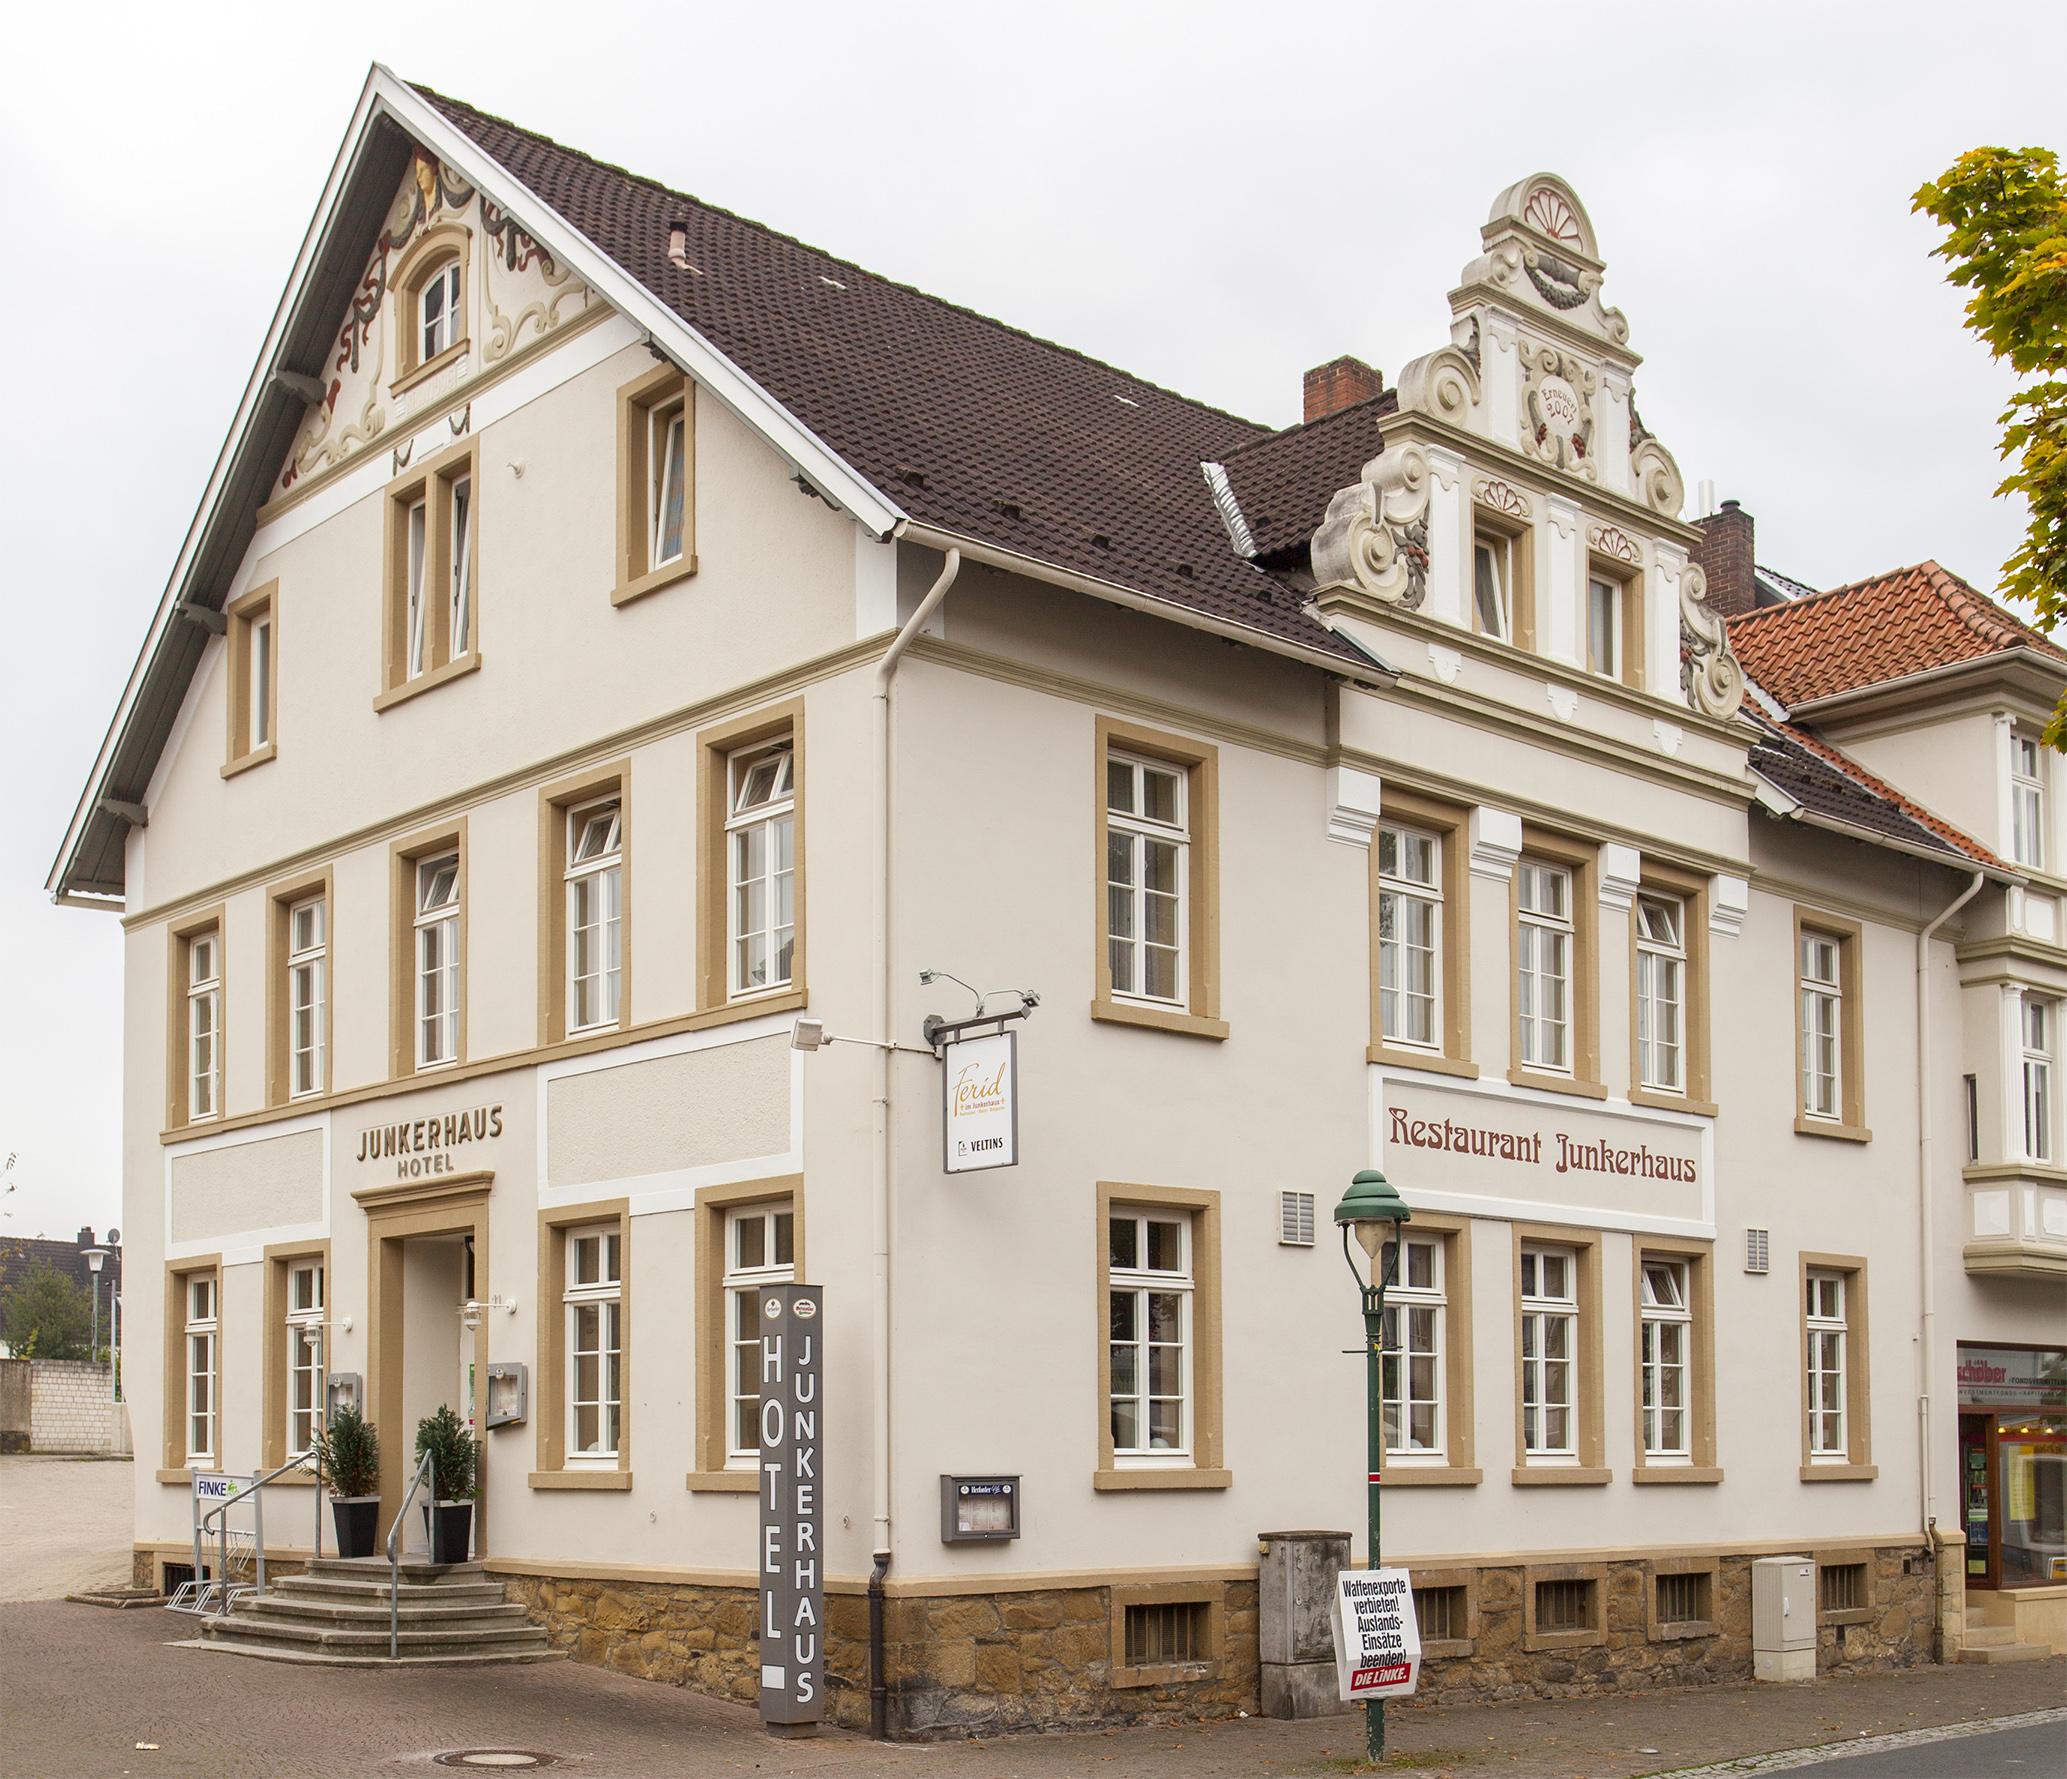 Hotel Junkerhaus Bad Salzuflen